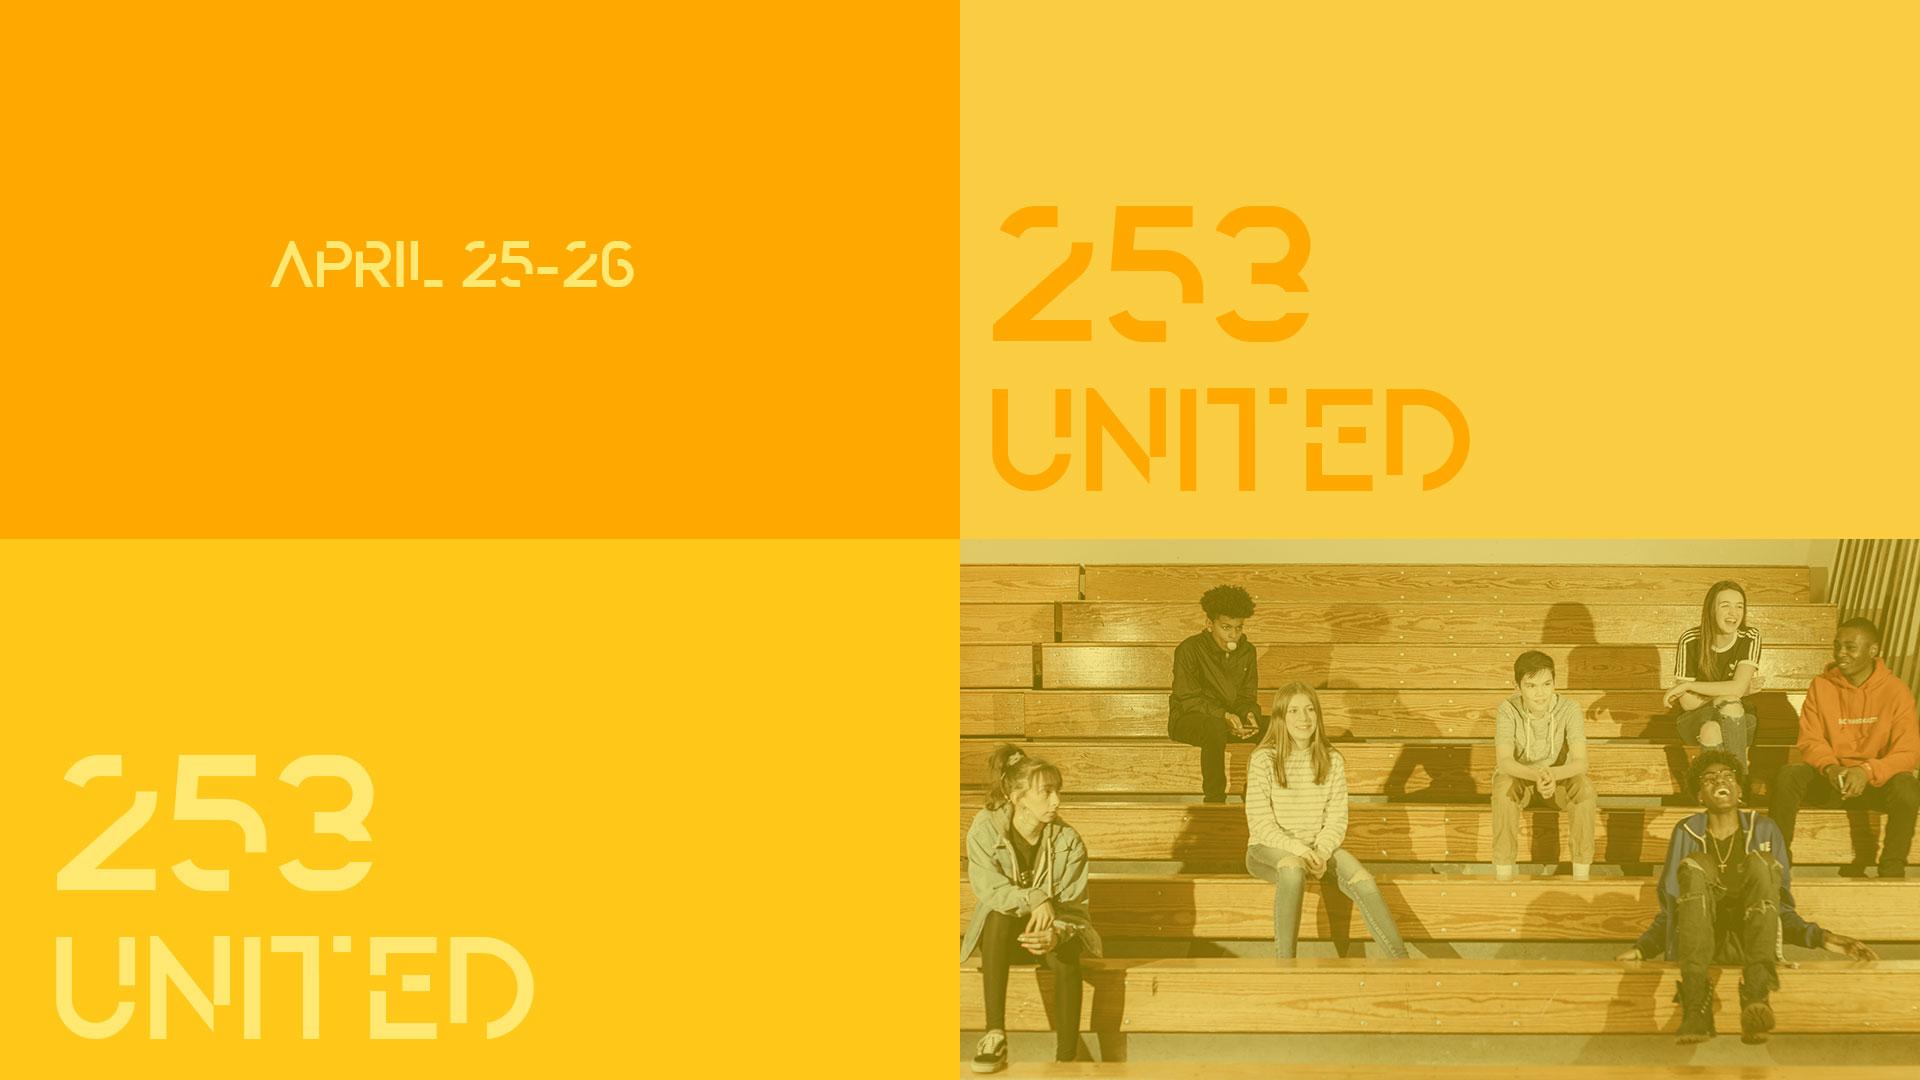 Life Center | 253 United